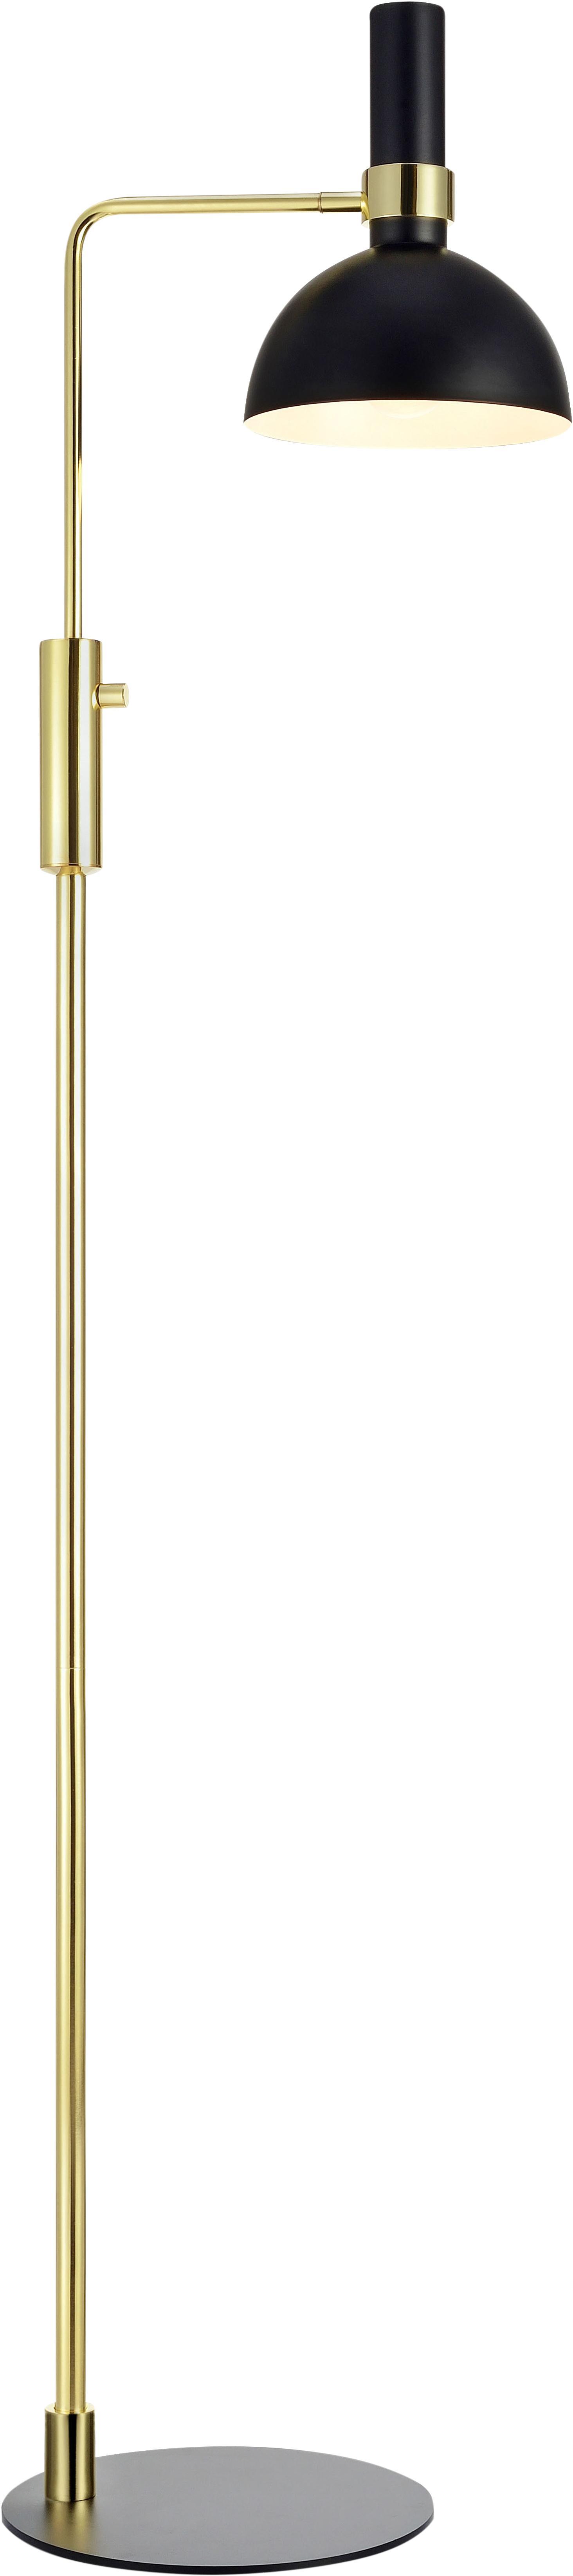 Leeslamp Larry, verstelbaar, Lampvoet: messing, Zwart, messingkleurig, 33 x 146 cm